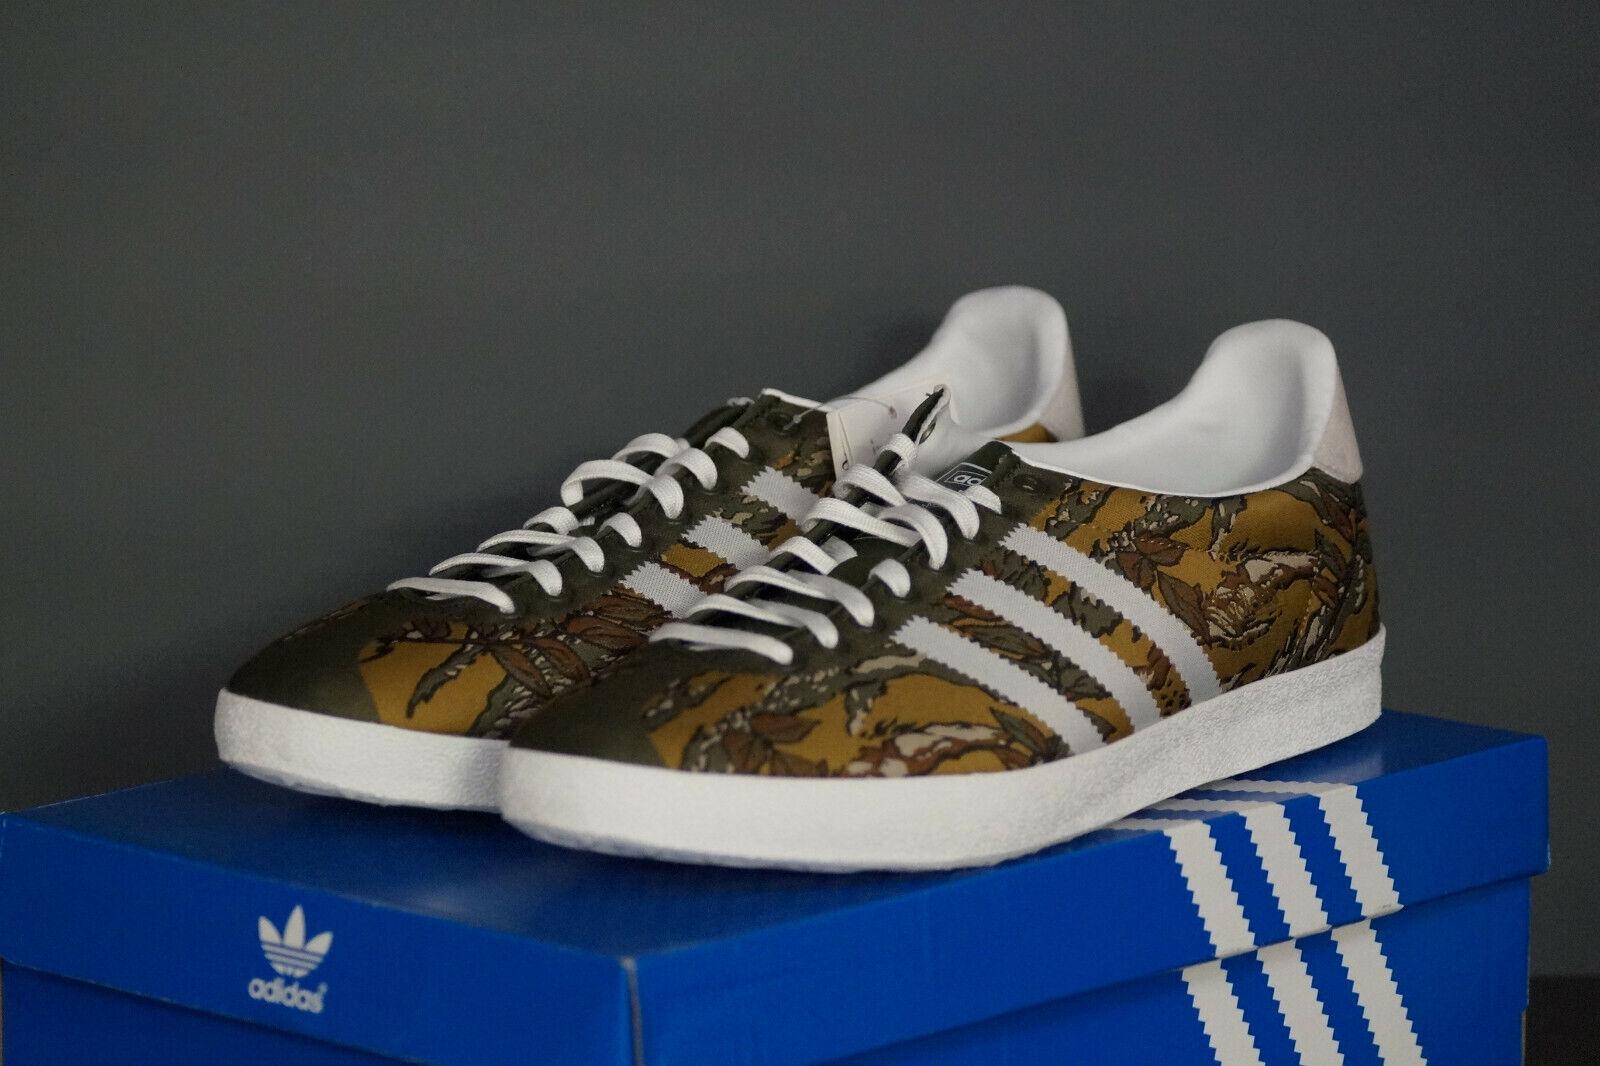 Outlet Store Adidas Gazelle og multiFarbe M19657 camo